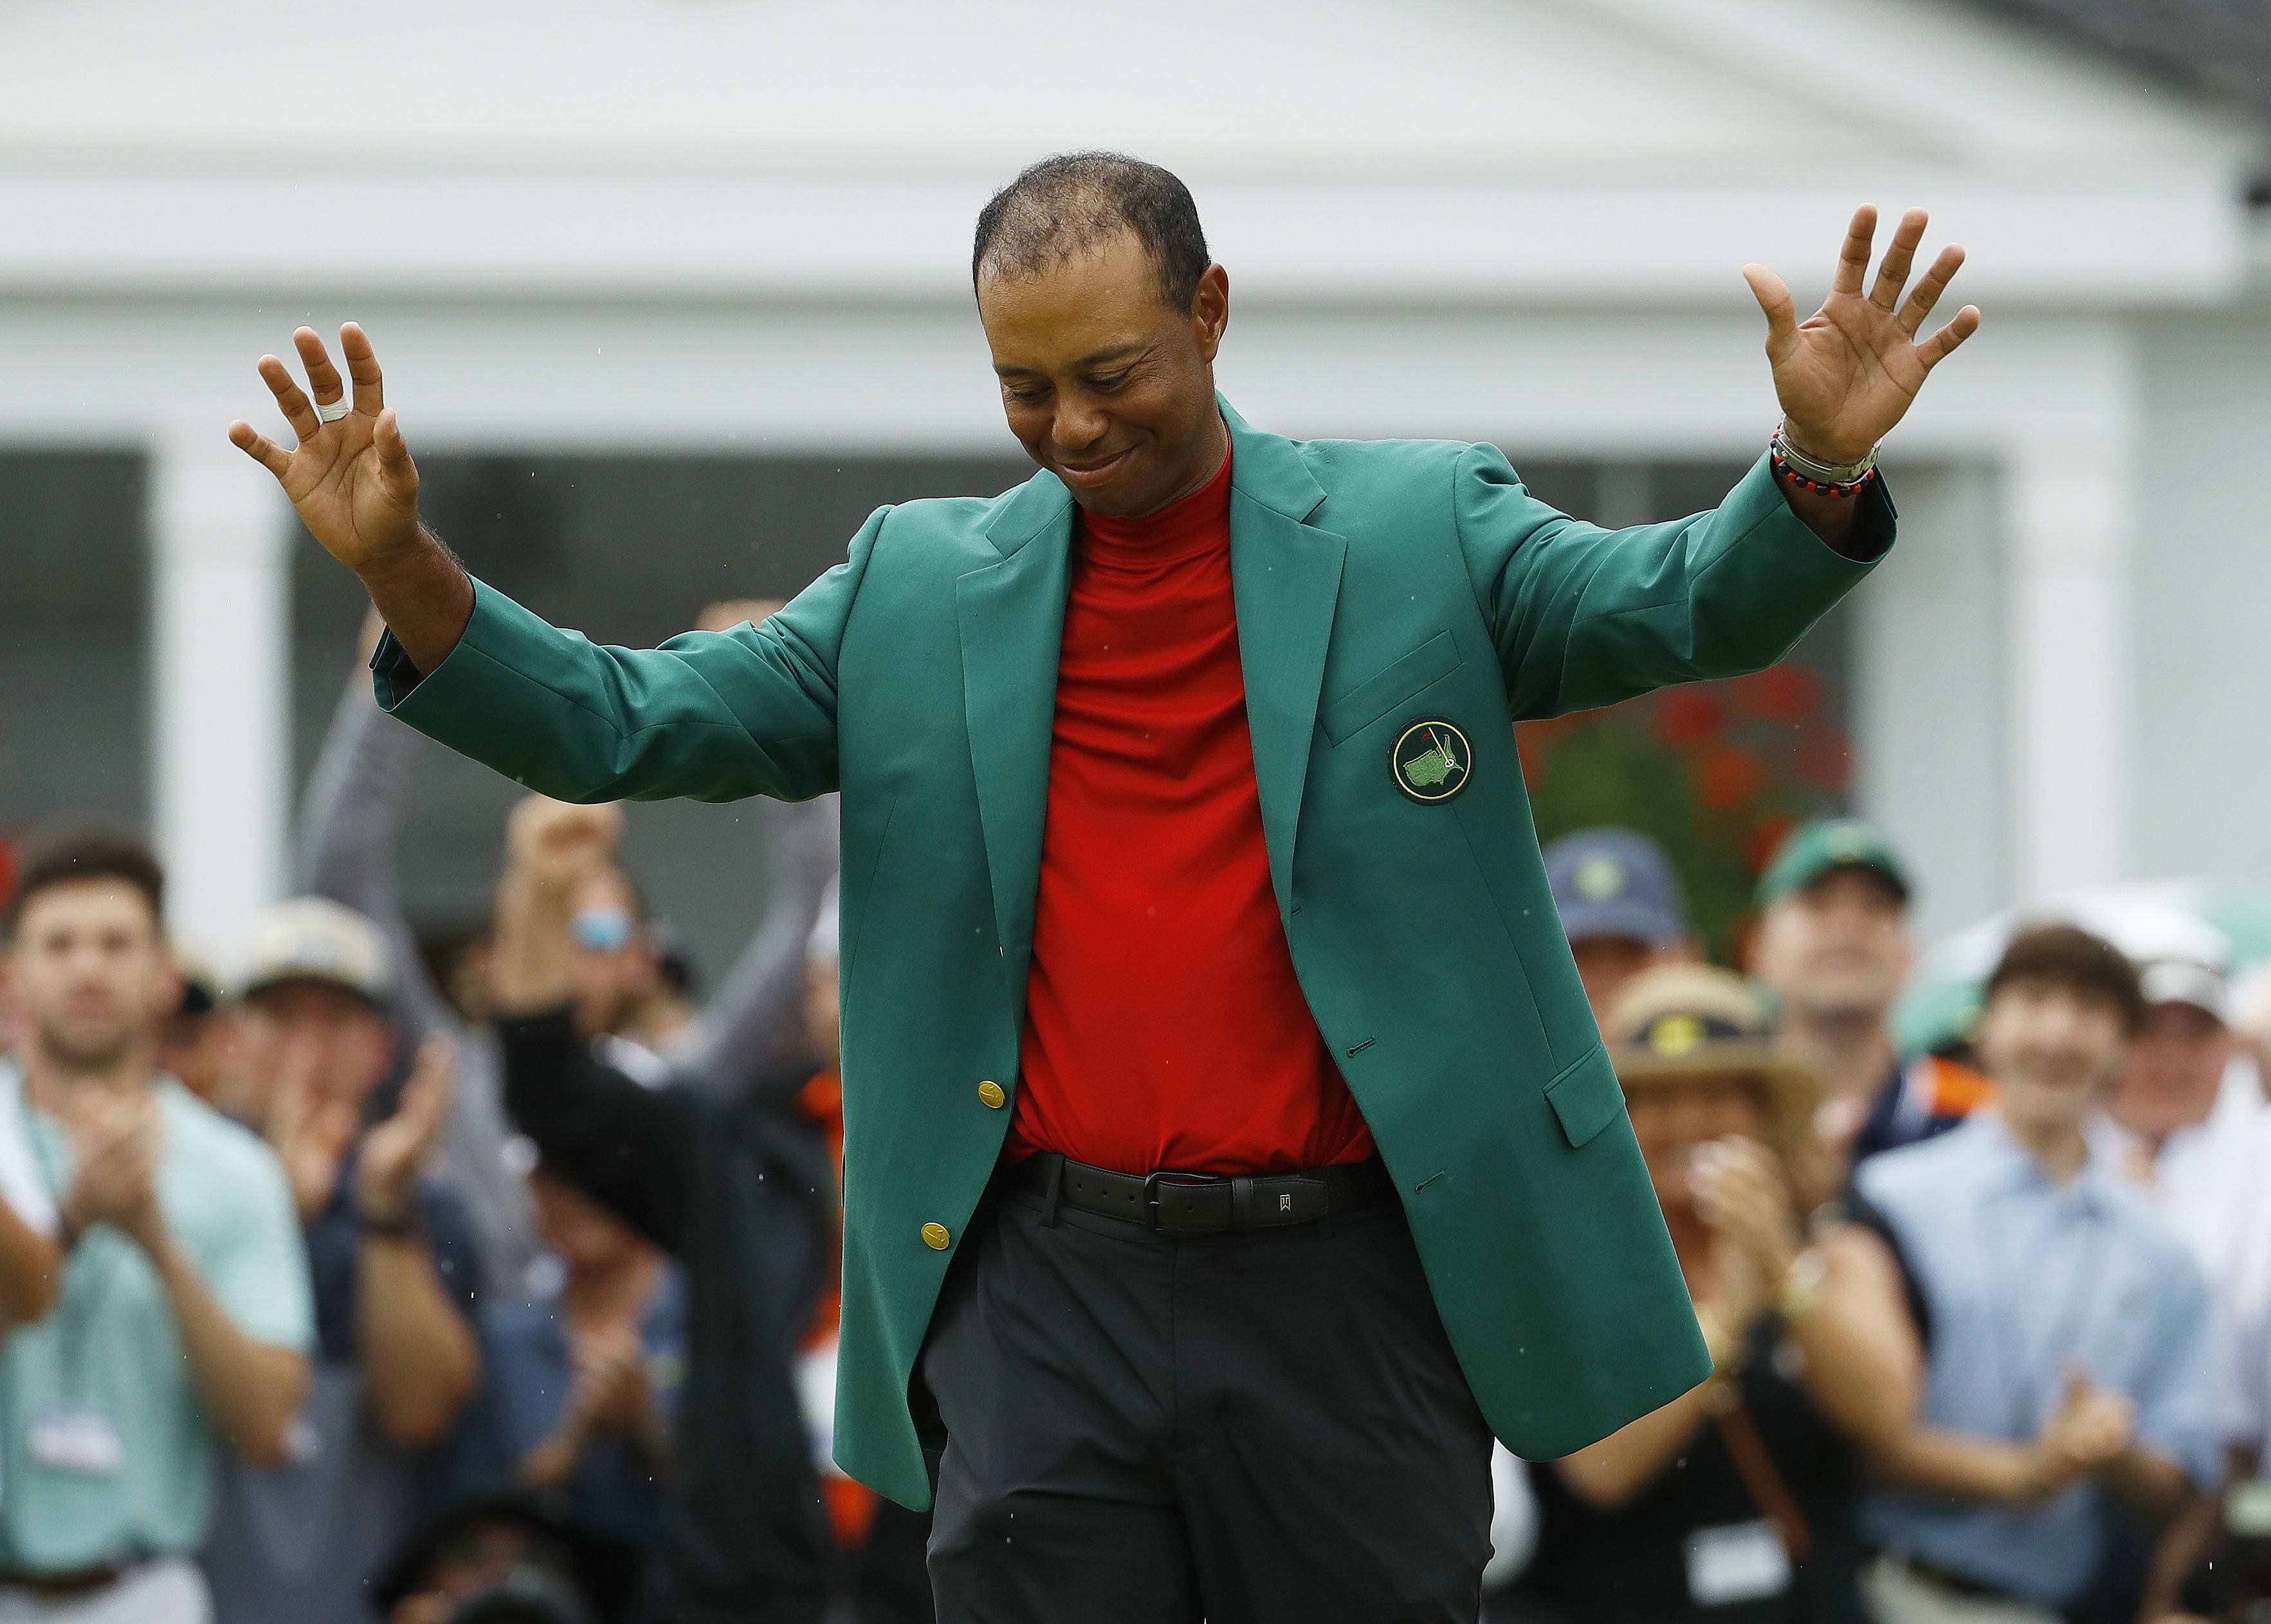 ESPN sportswriter blasts Masters Tournament as reference slavery, Jim Crow